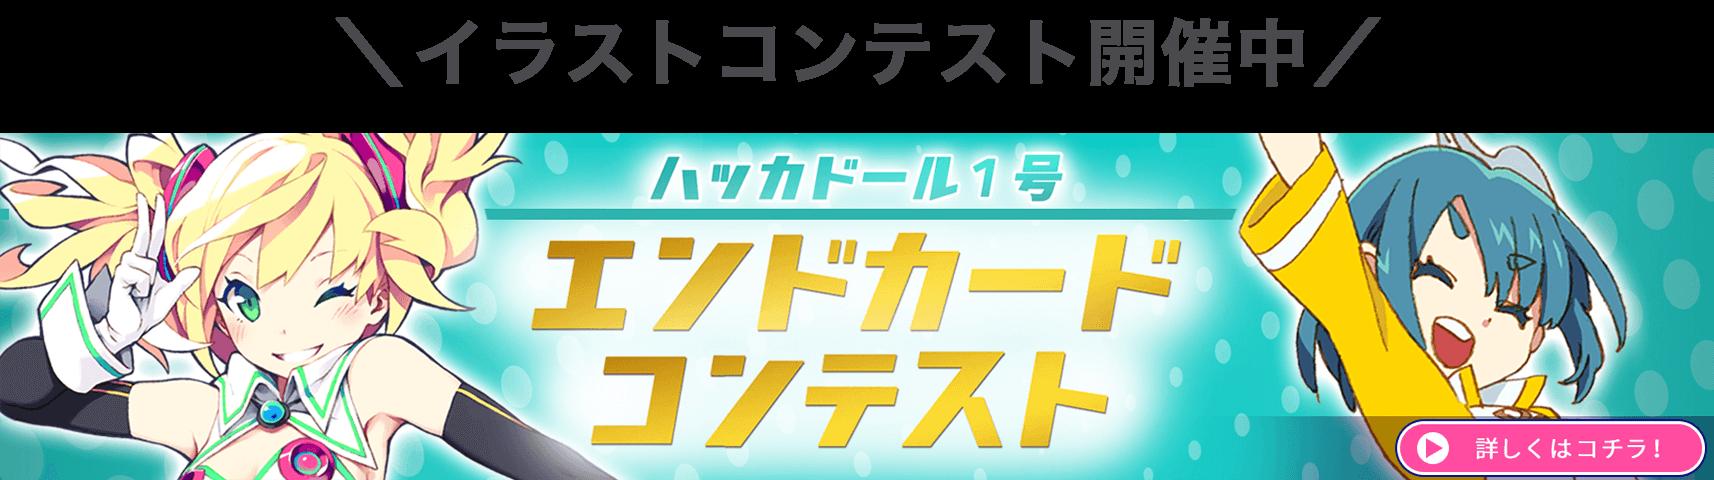 Hackadoll banner